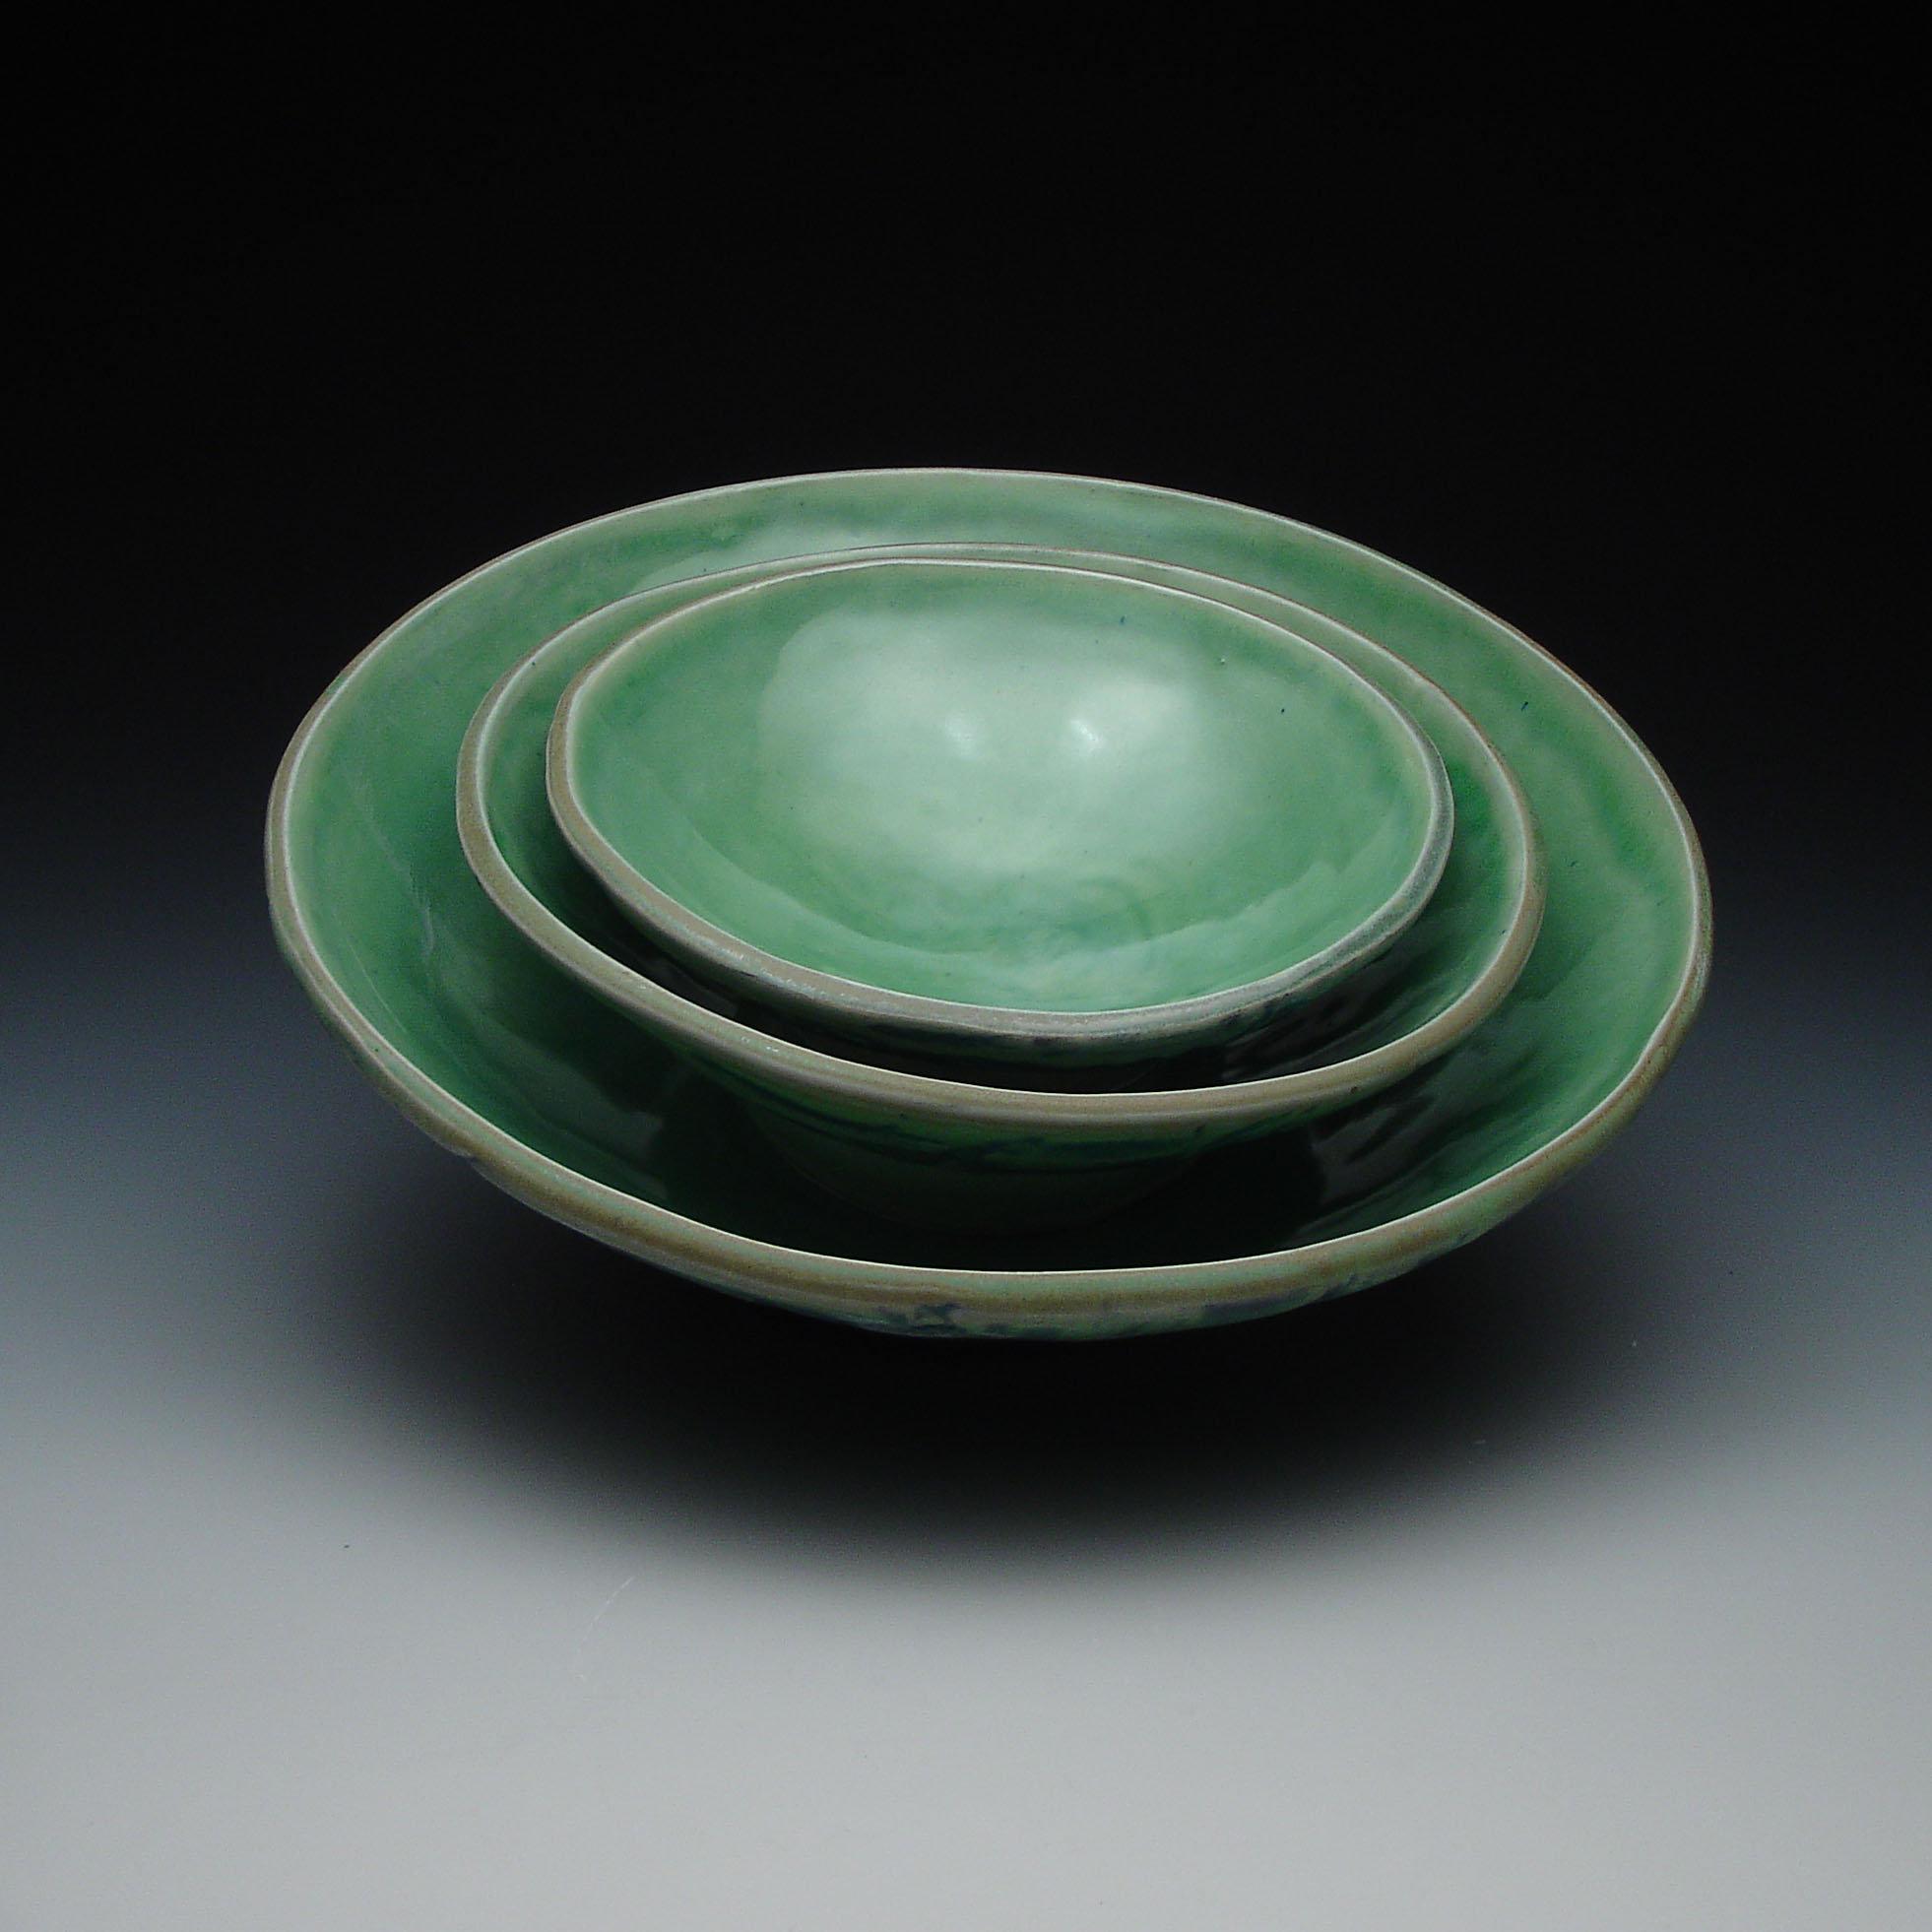 Ceramic Nesting Bowls by Frank Saliani (Ceramic Bowls) | Artful Home